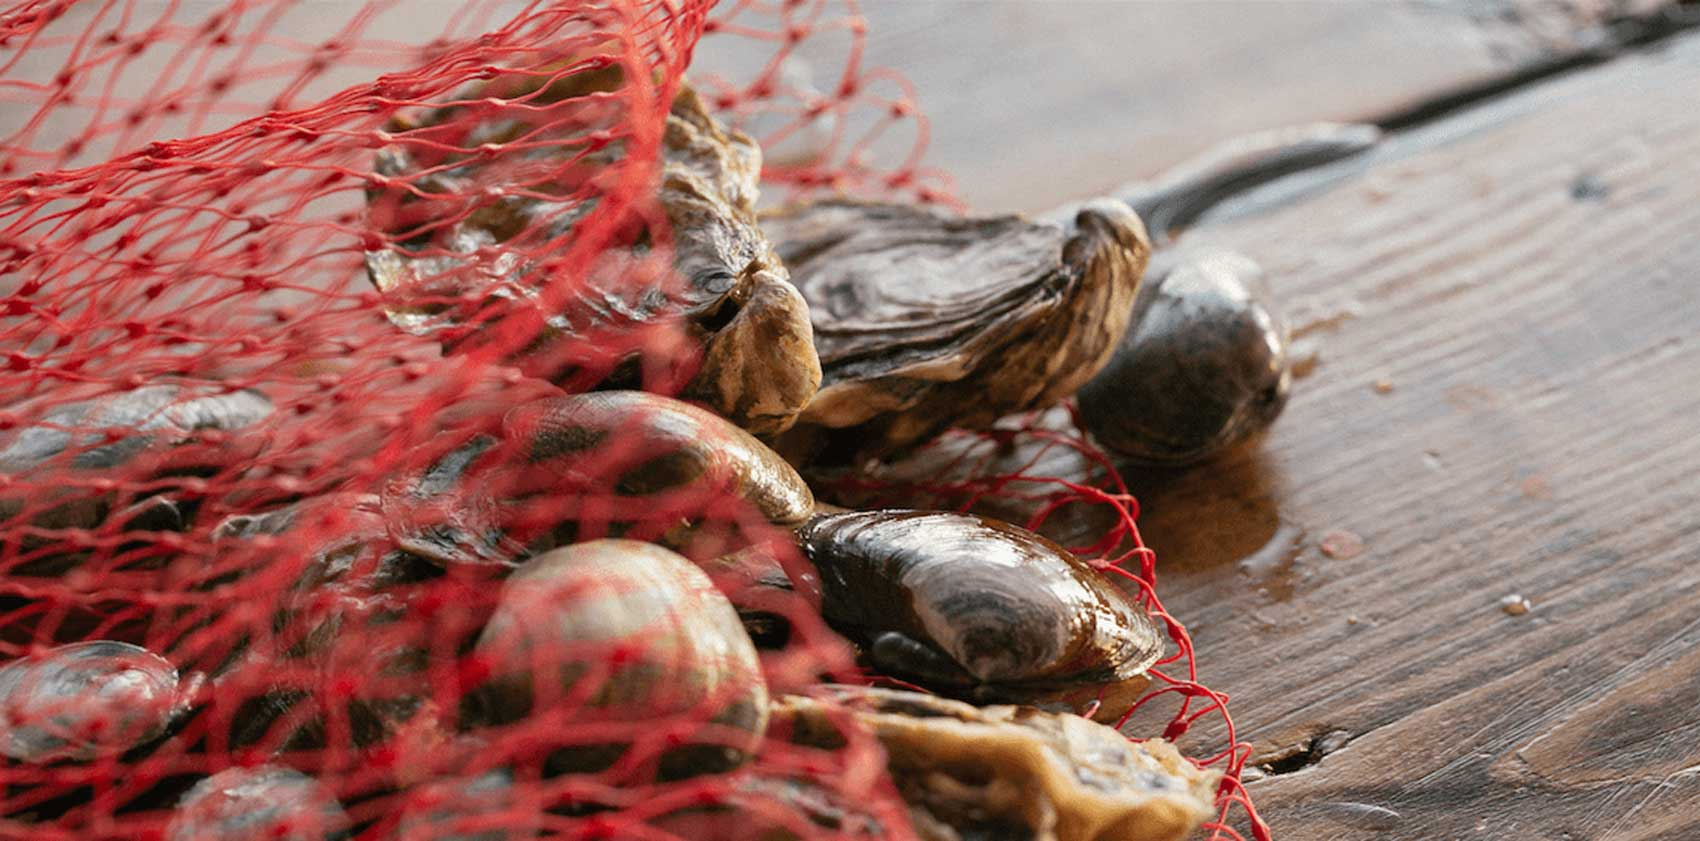 Baywater Shellfish Company